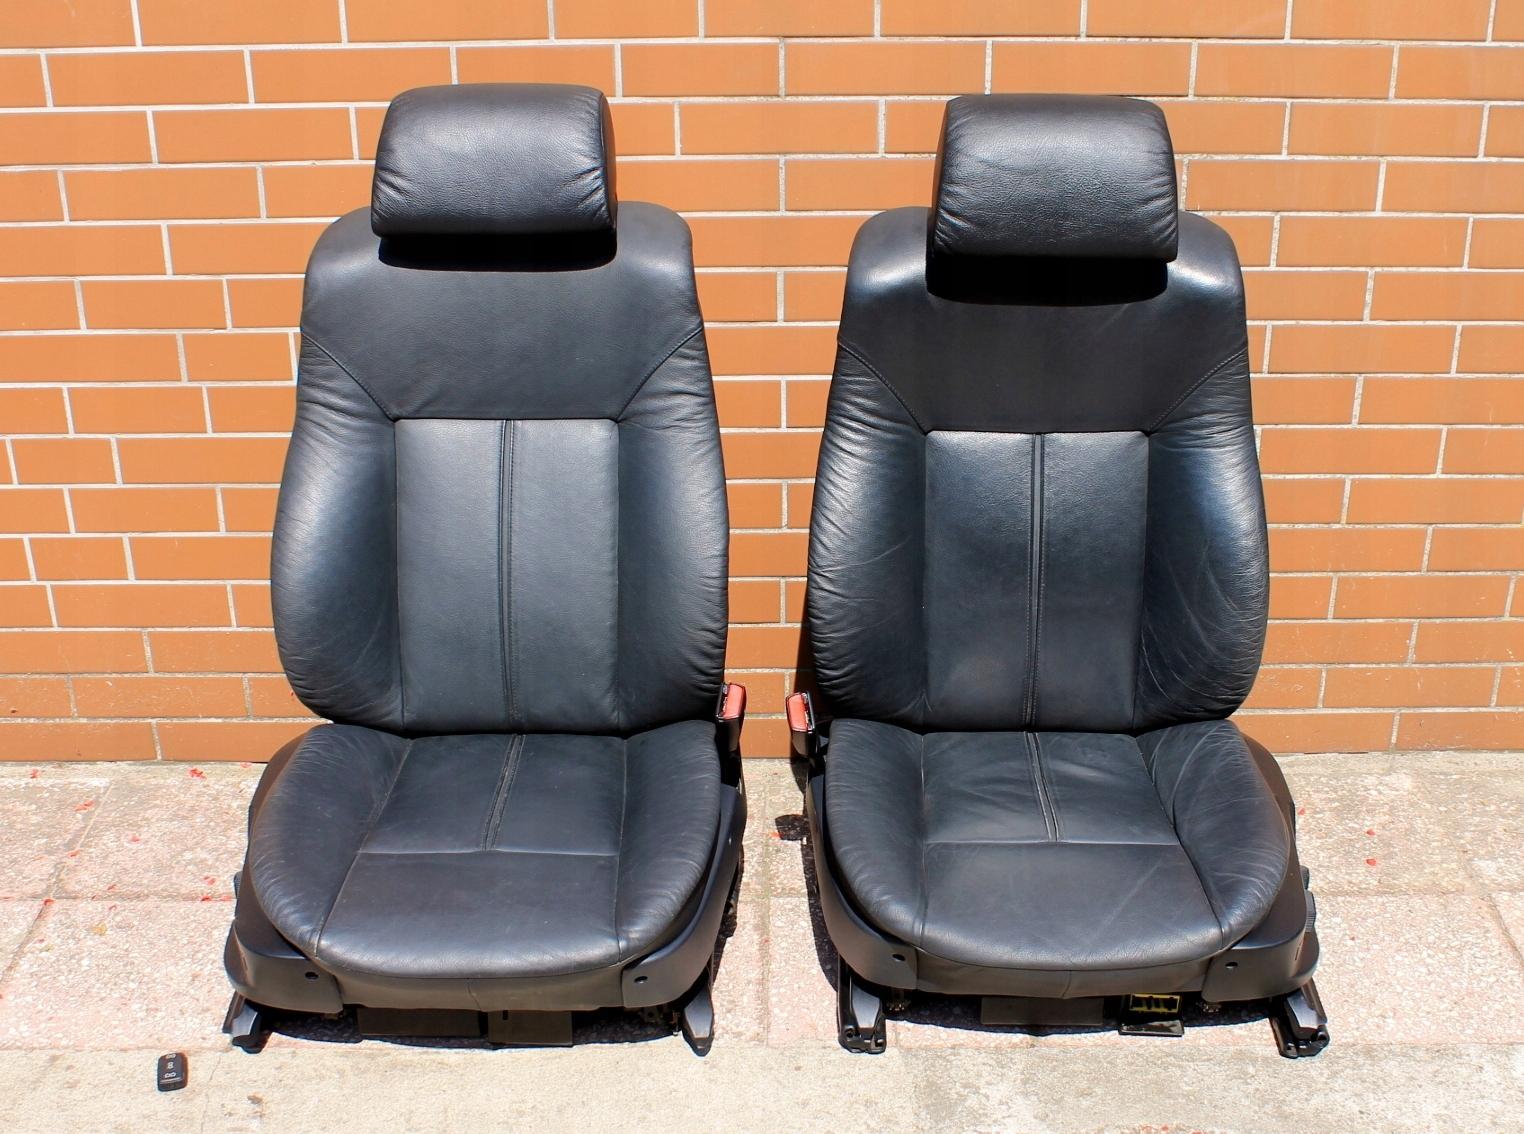 Bmw E38 Fotele Czarna Skóra Komfort Wentylowane Eu